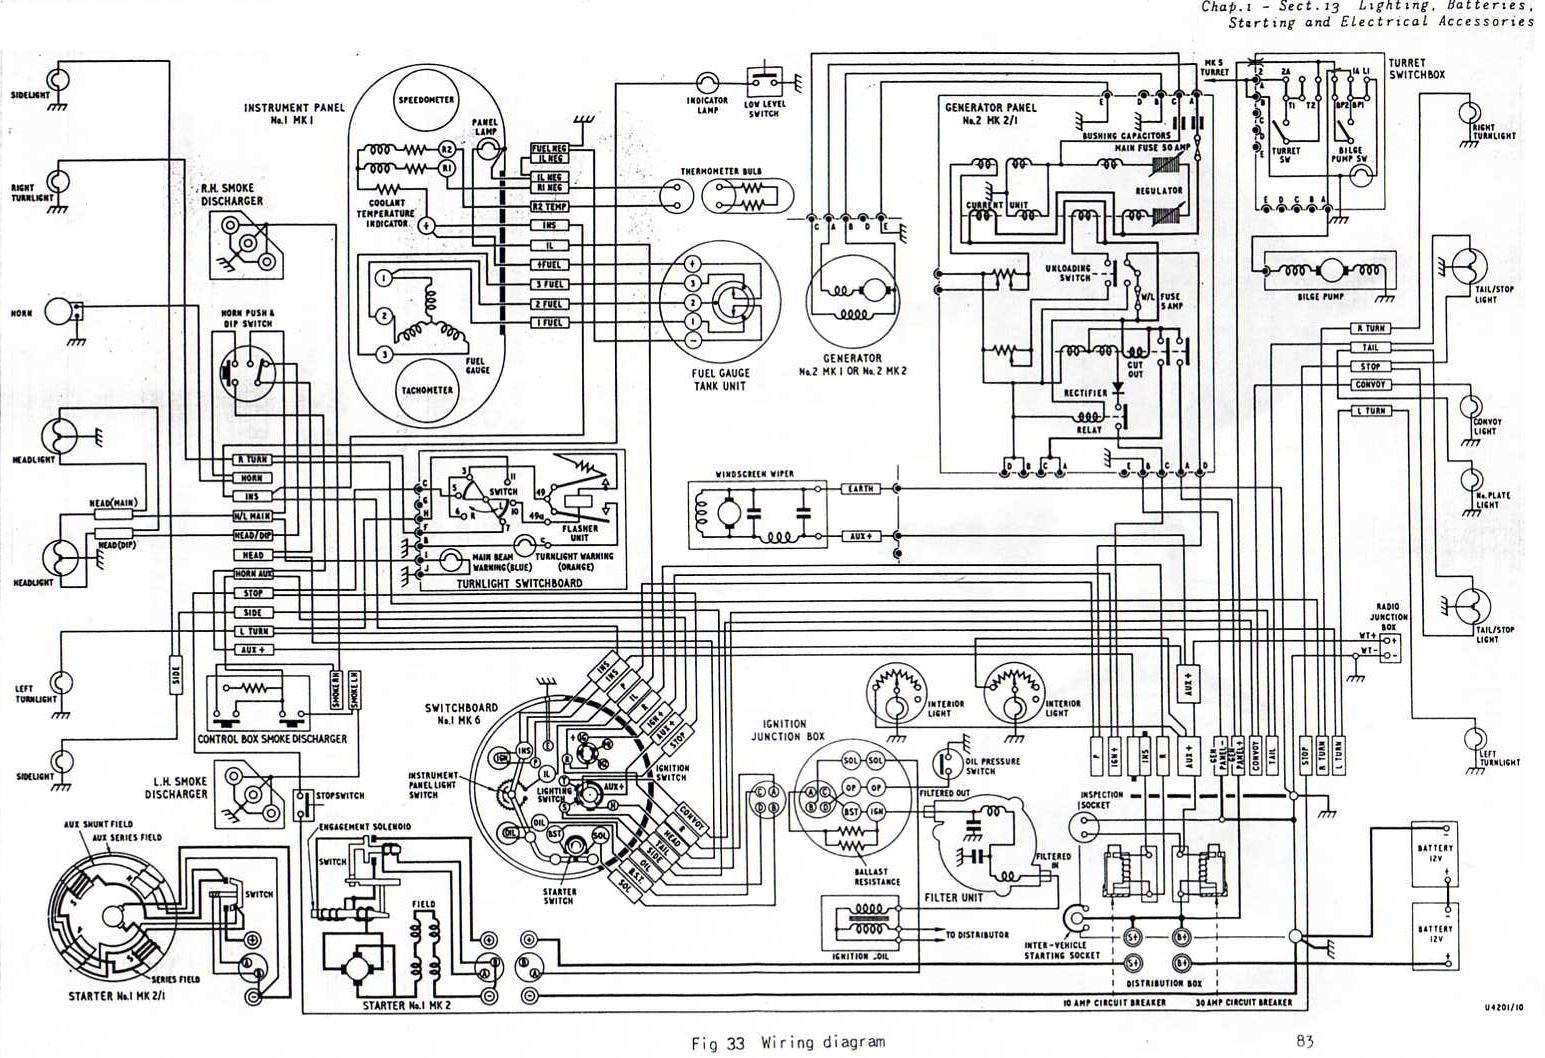 DIAGRAM] Block Diagram 80386 FULL Version HD Quality Diagram 80386 -  MOTOGPGEAR4LESS.DELI-MULTISERVICES.FRmotogpgear4less.deli-multiservices.fr